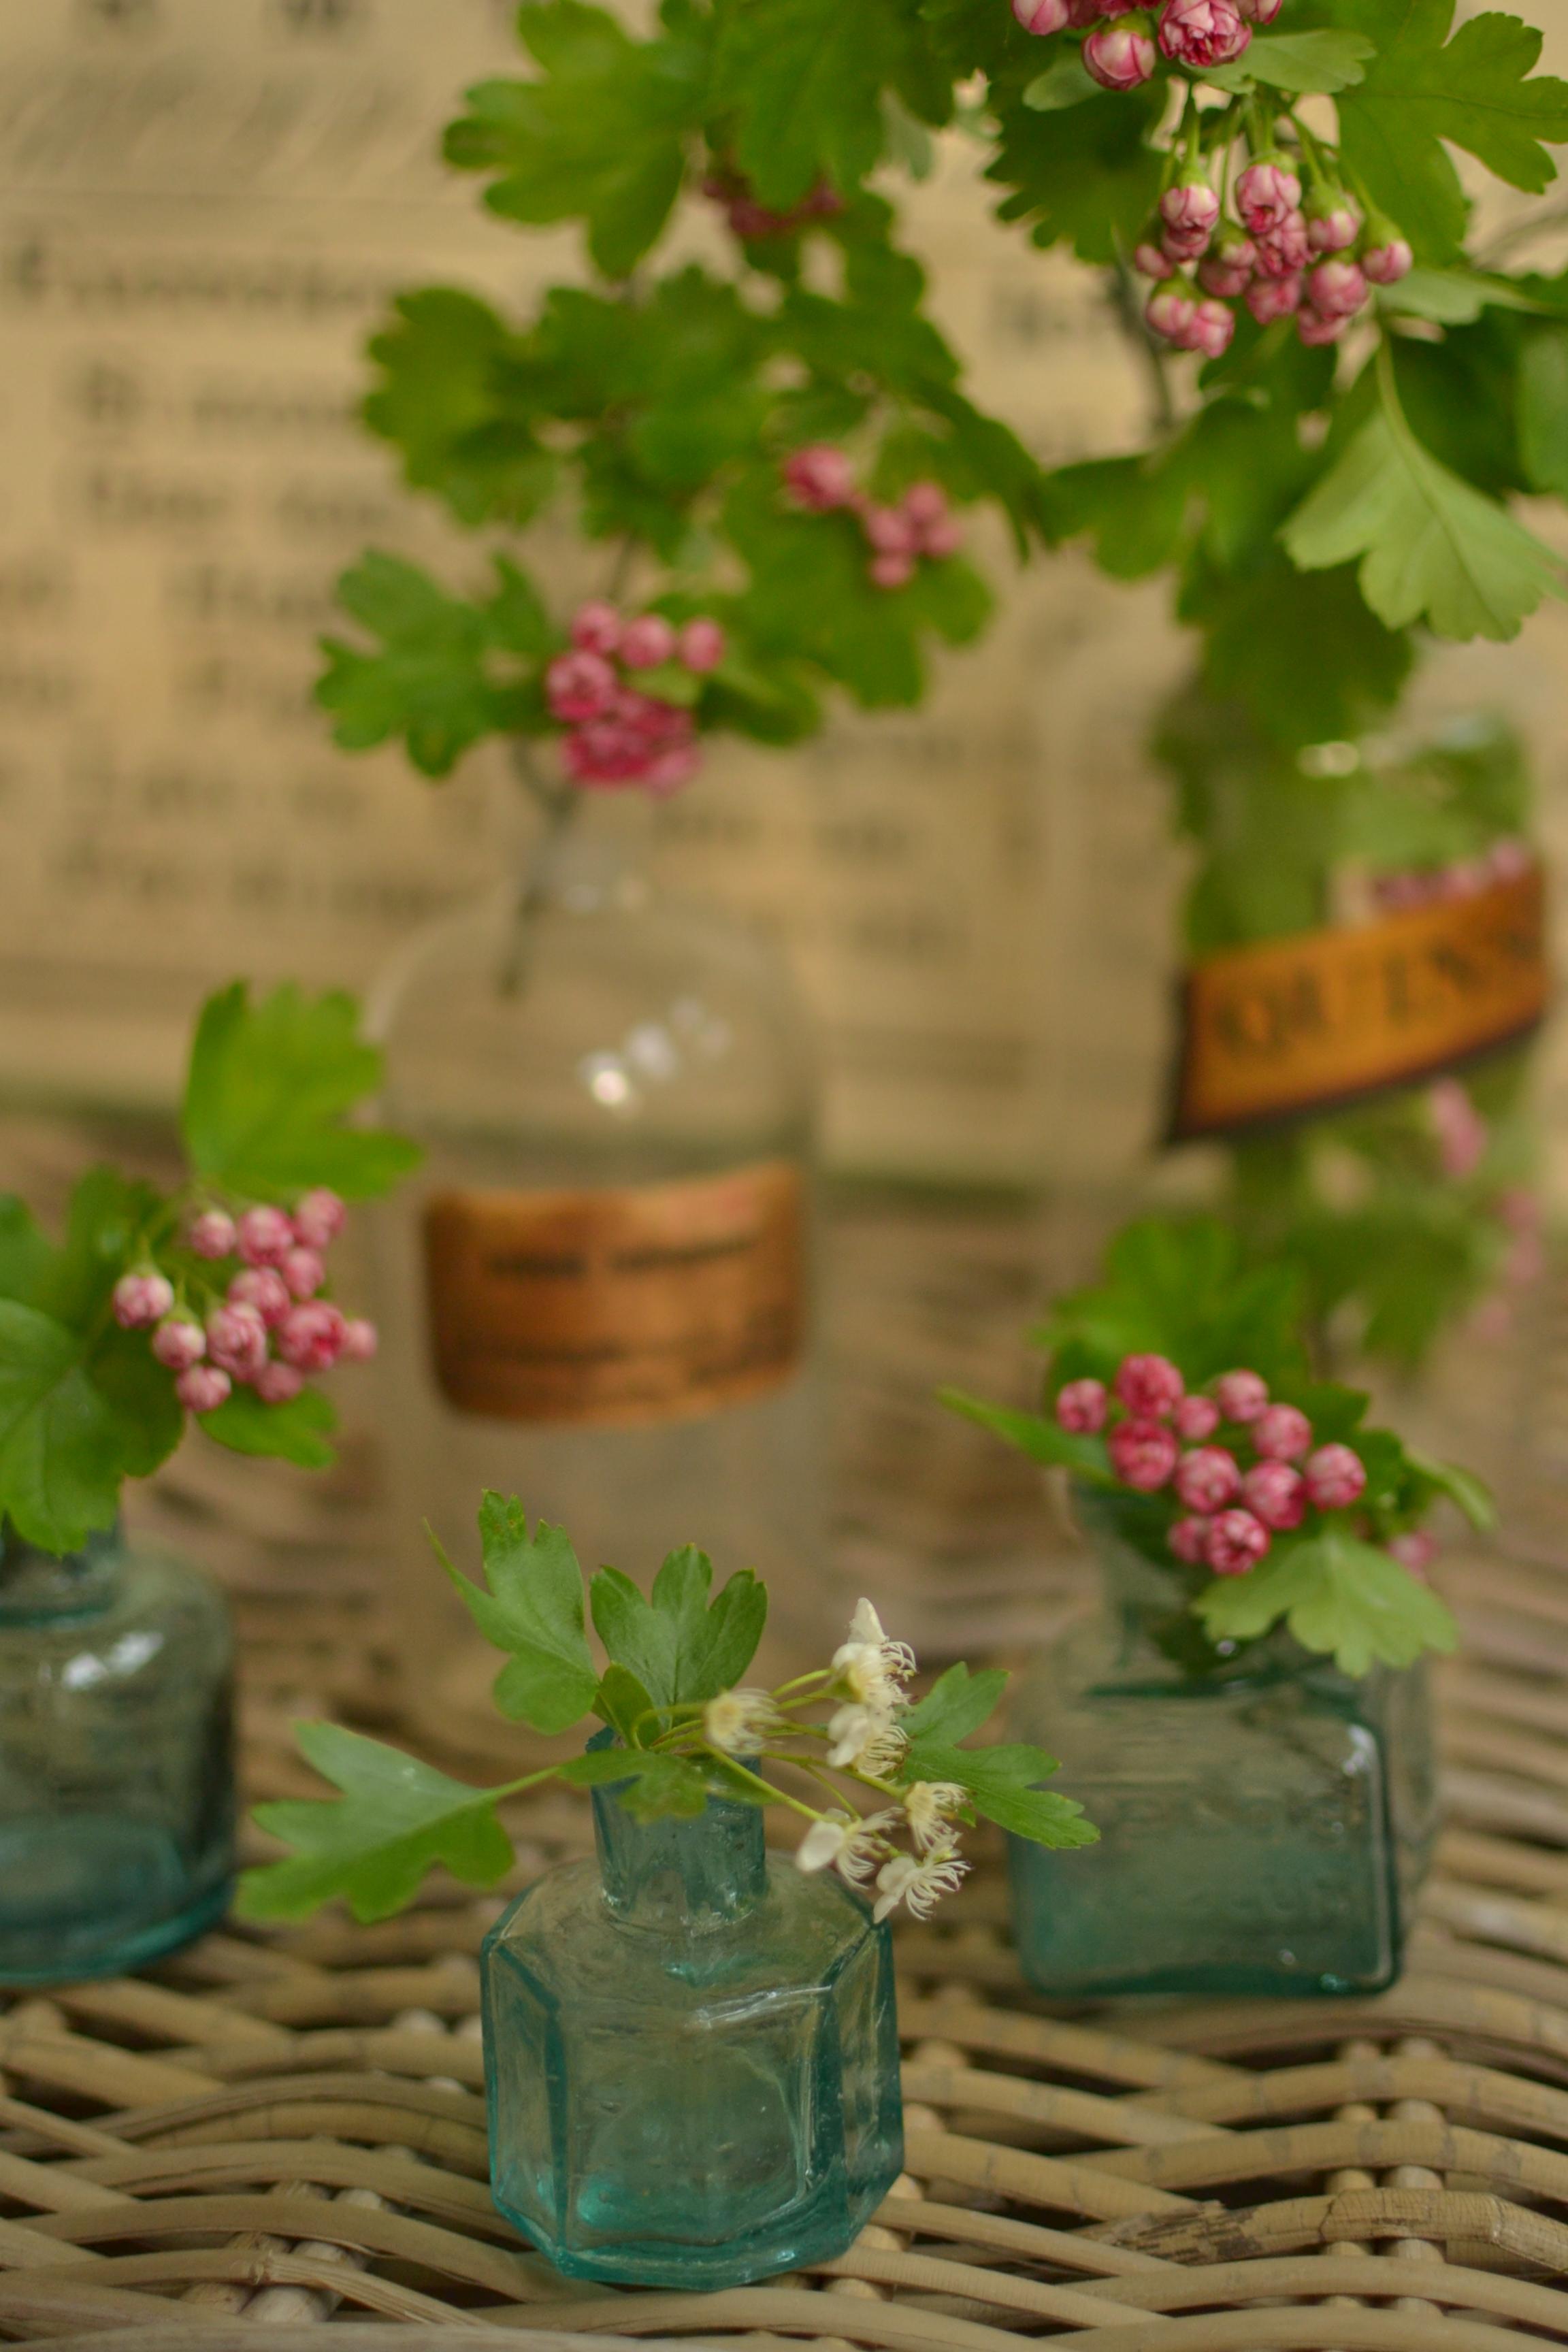 flowers in old glass bottles